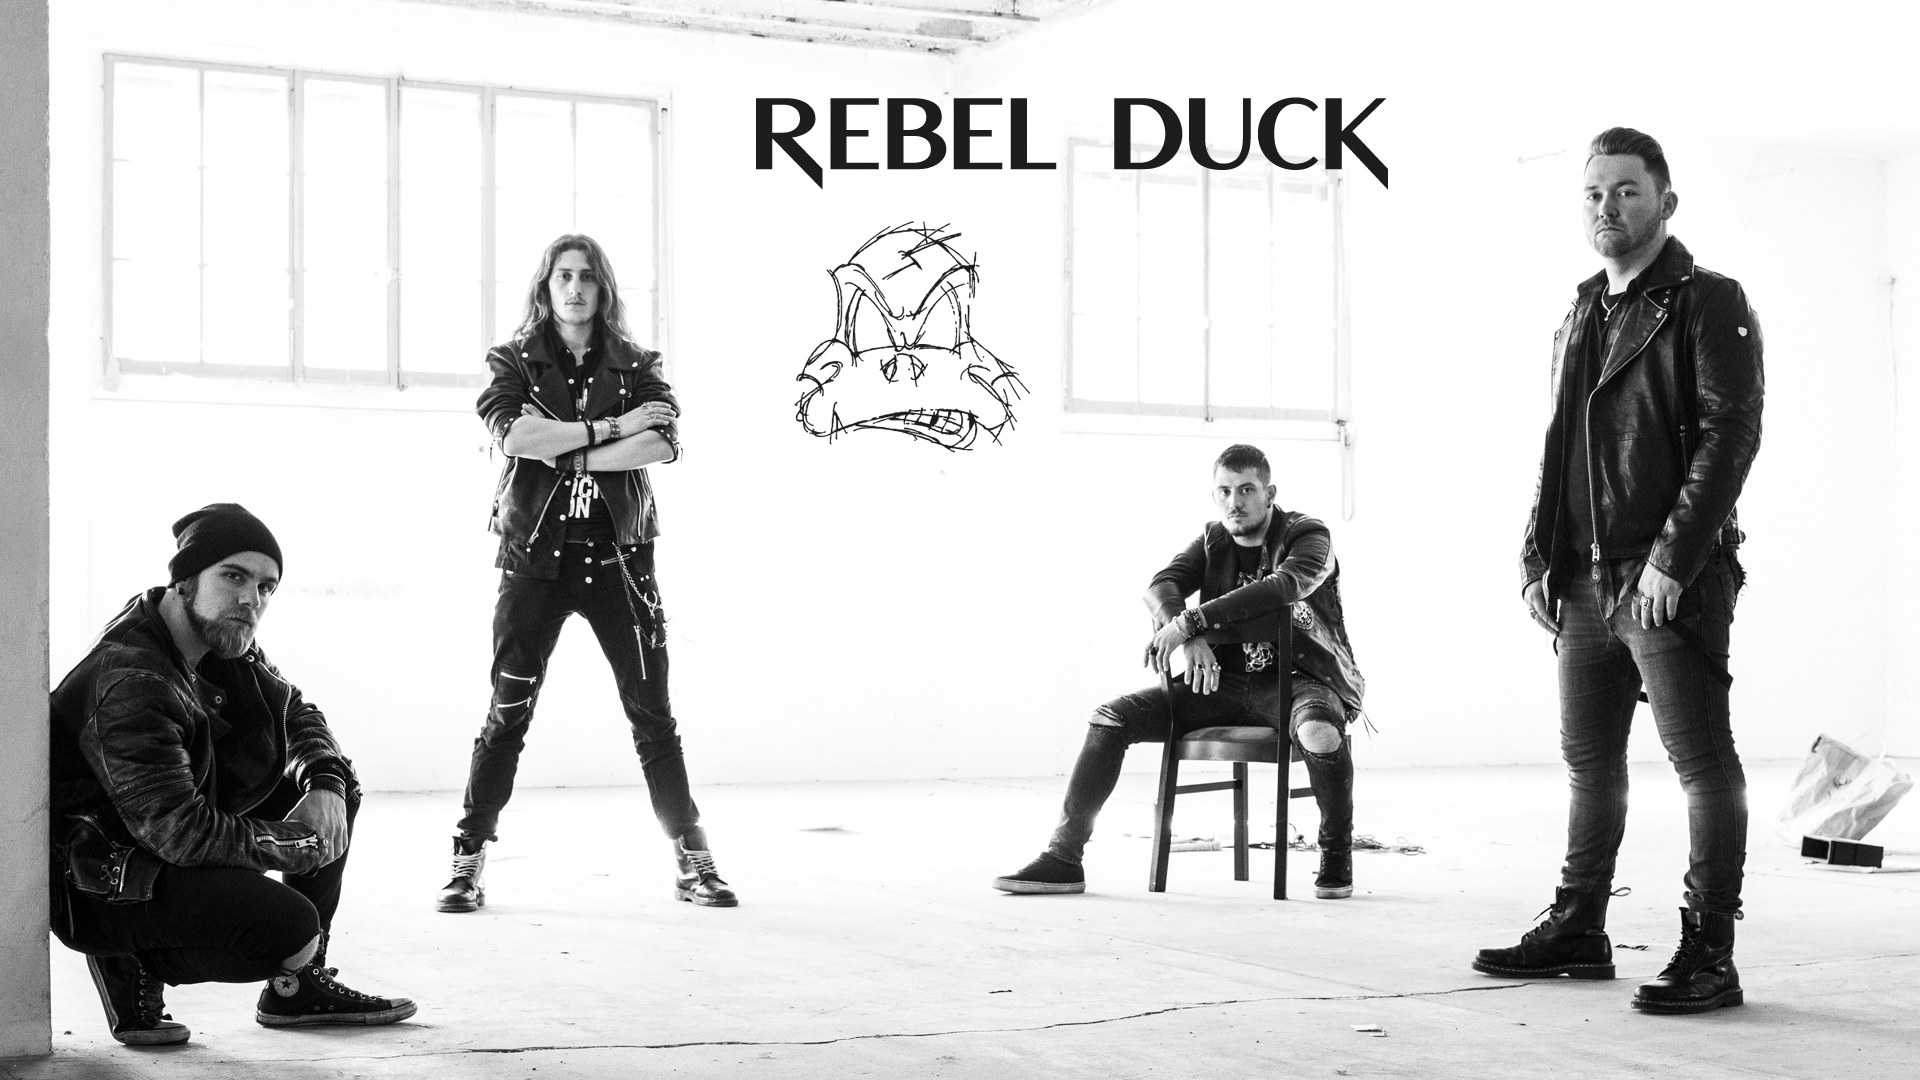 201107---REBEL-DUCK---WEB3